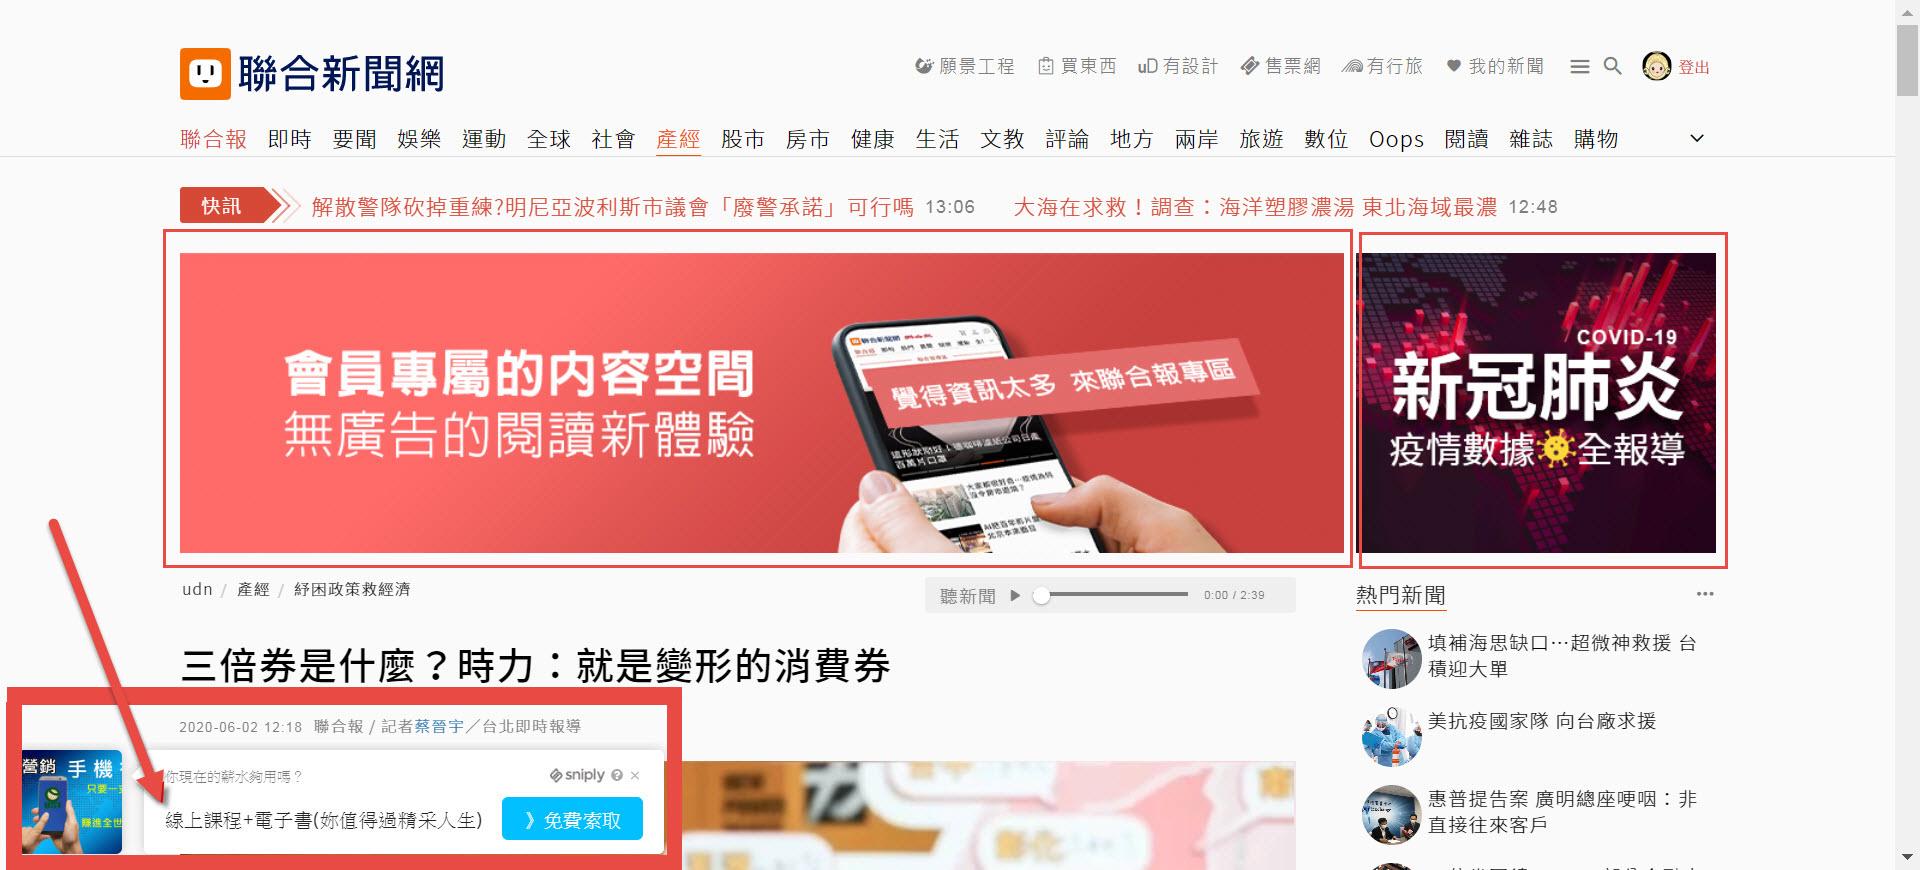 廣告框02.2 範例-UDN聯合新聞網 2020-06-07_19-45-04